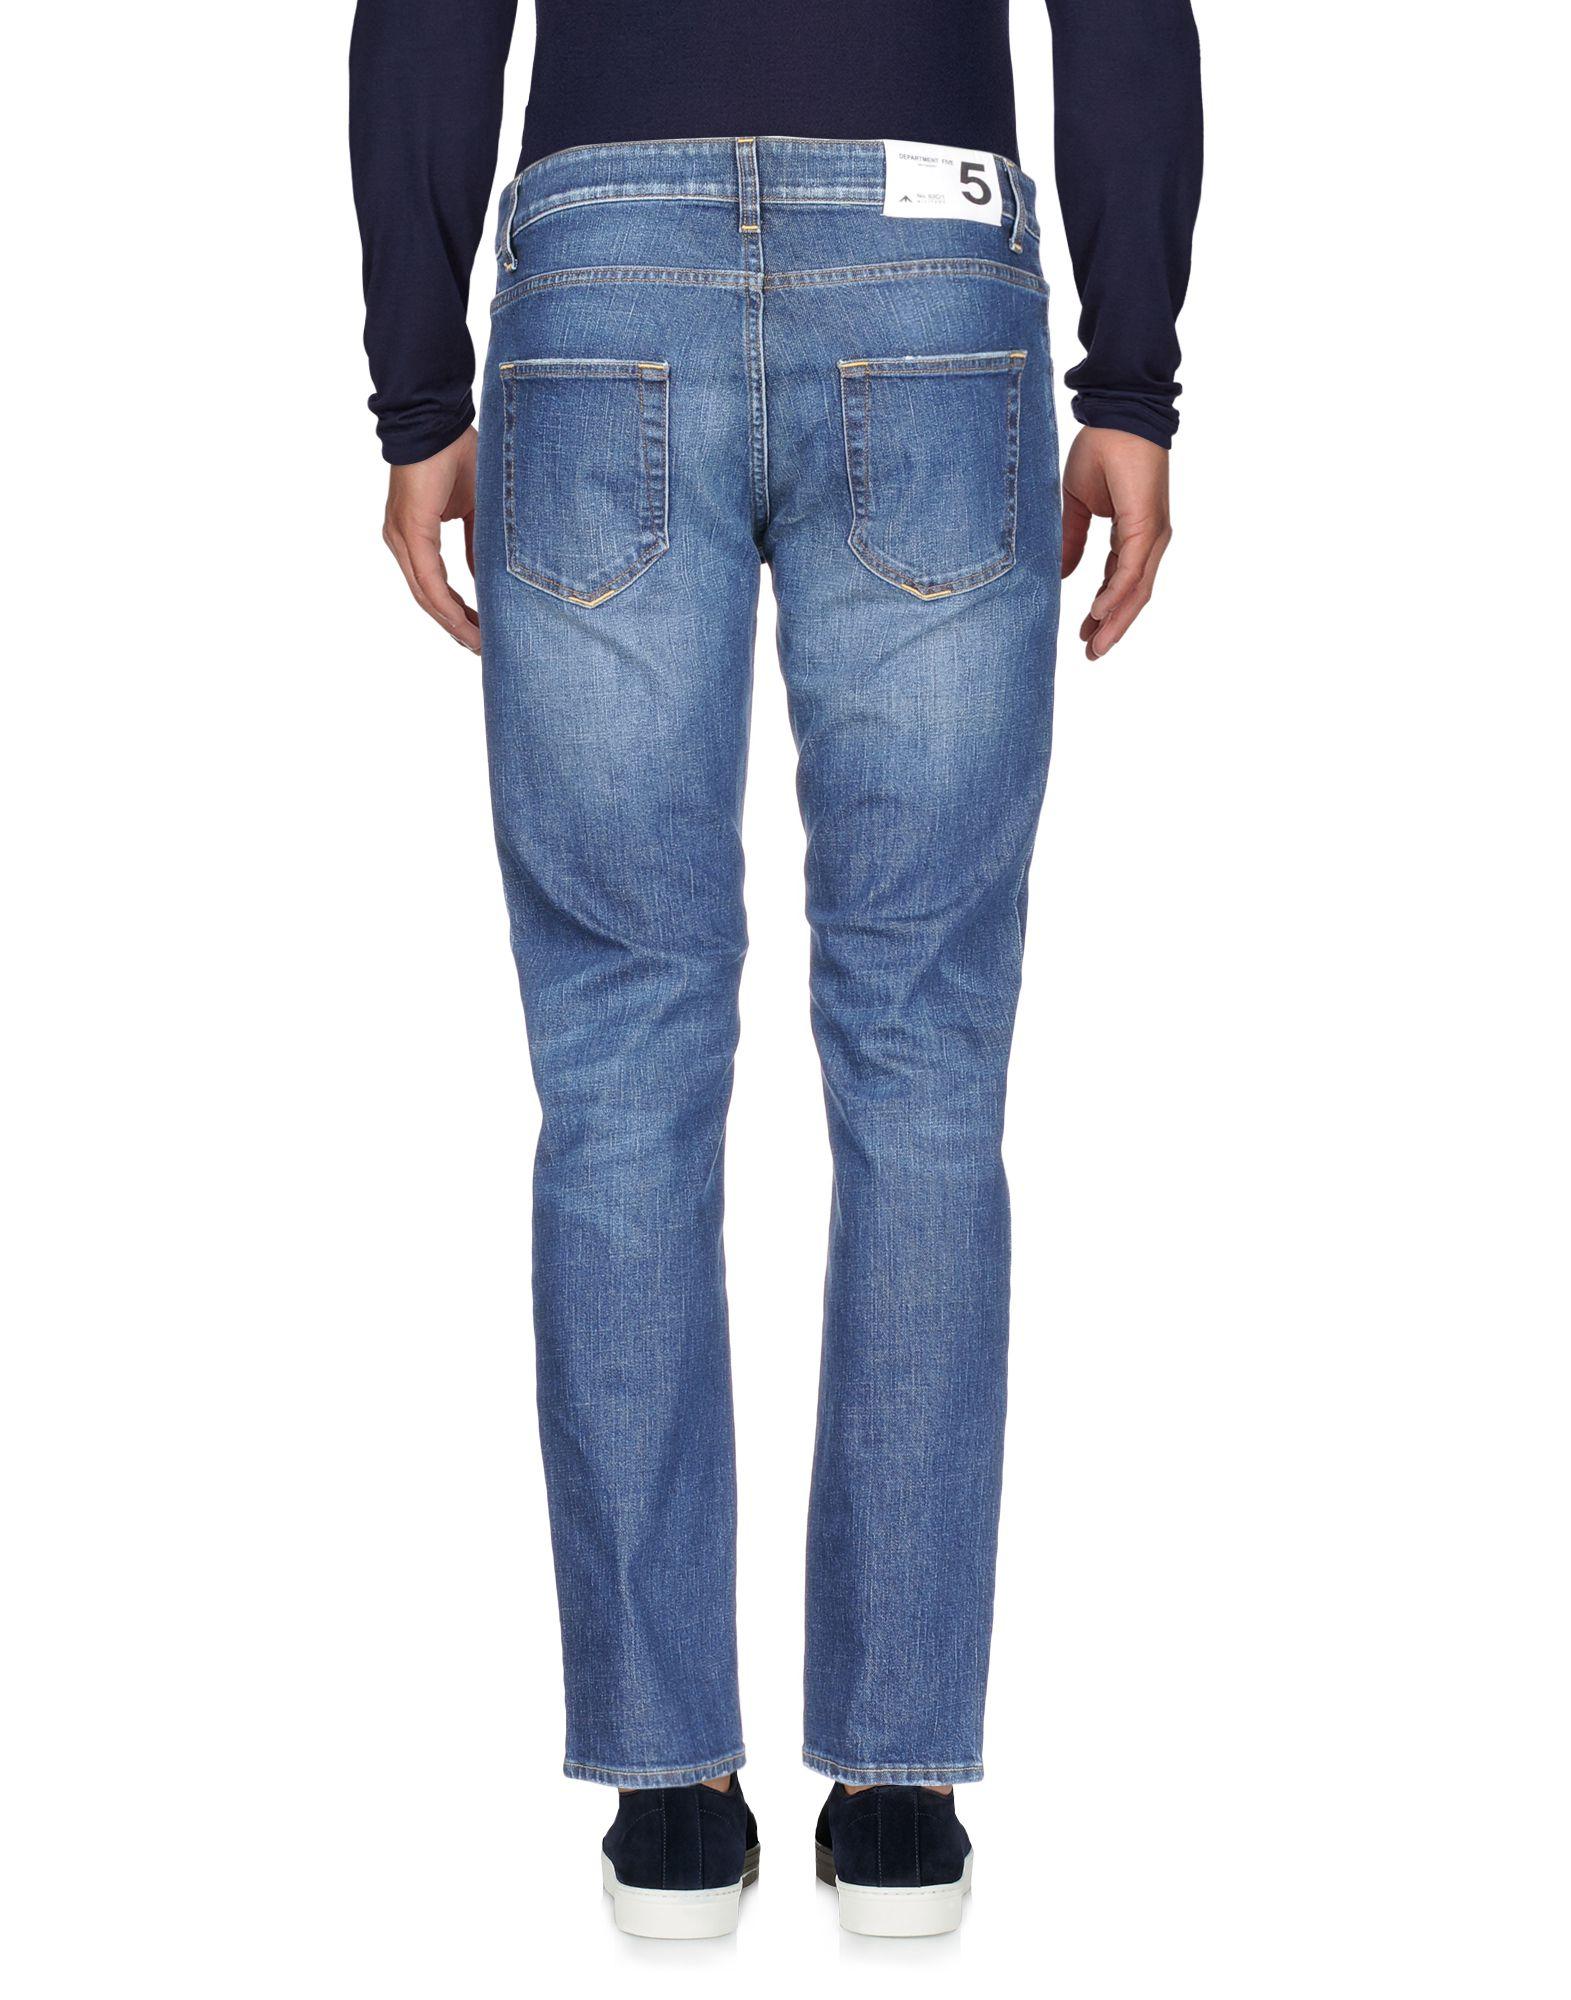 Pantaloni Jeans Department 5 Uomo Uomo 5 - 42671592XN ac03f8